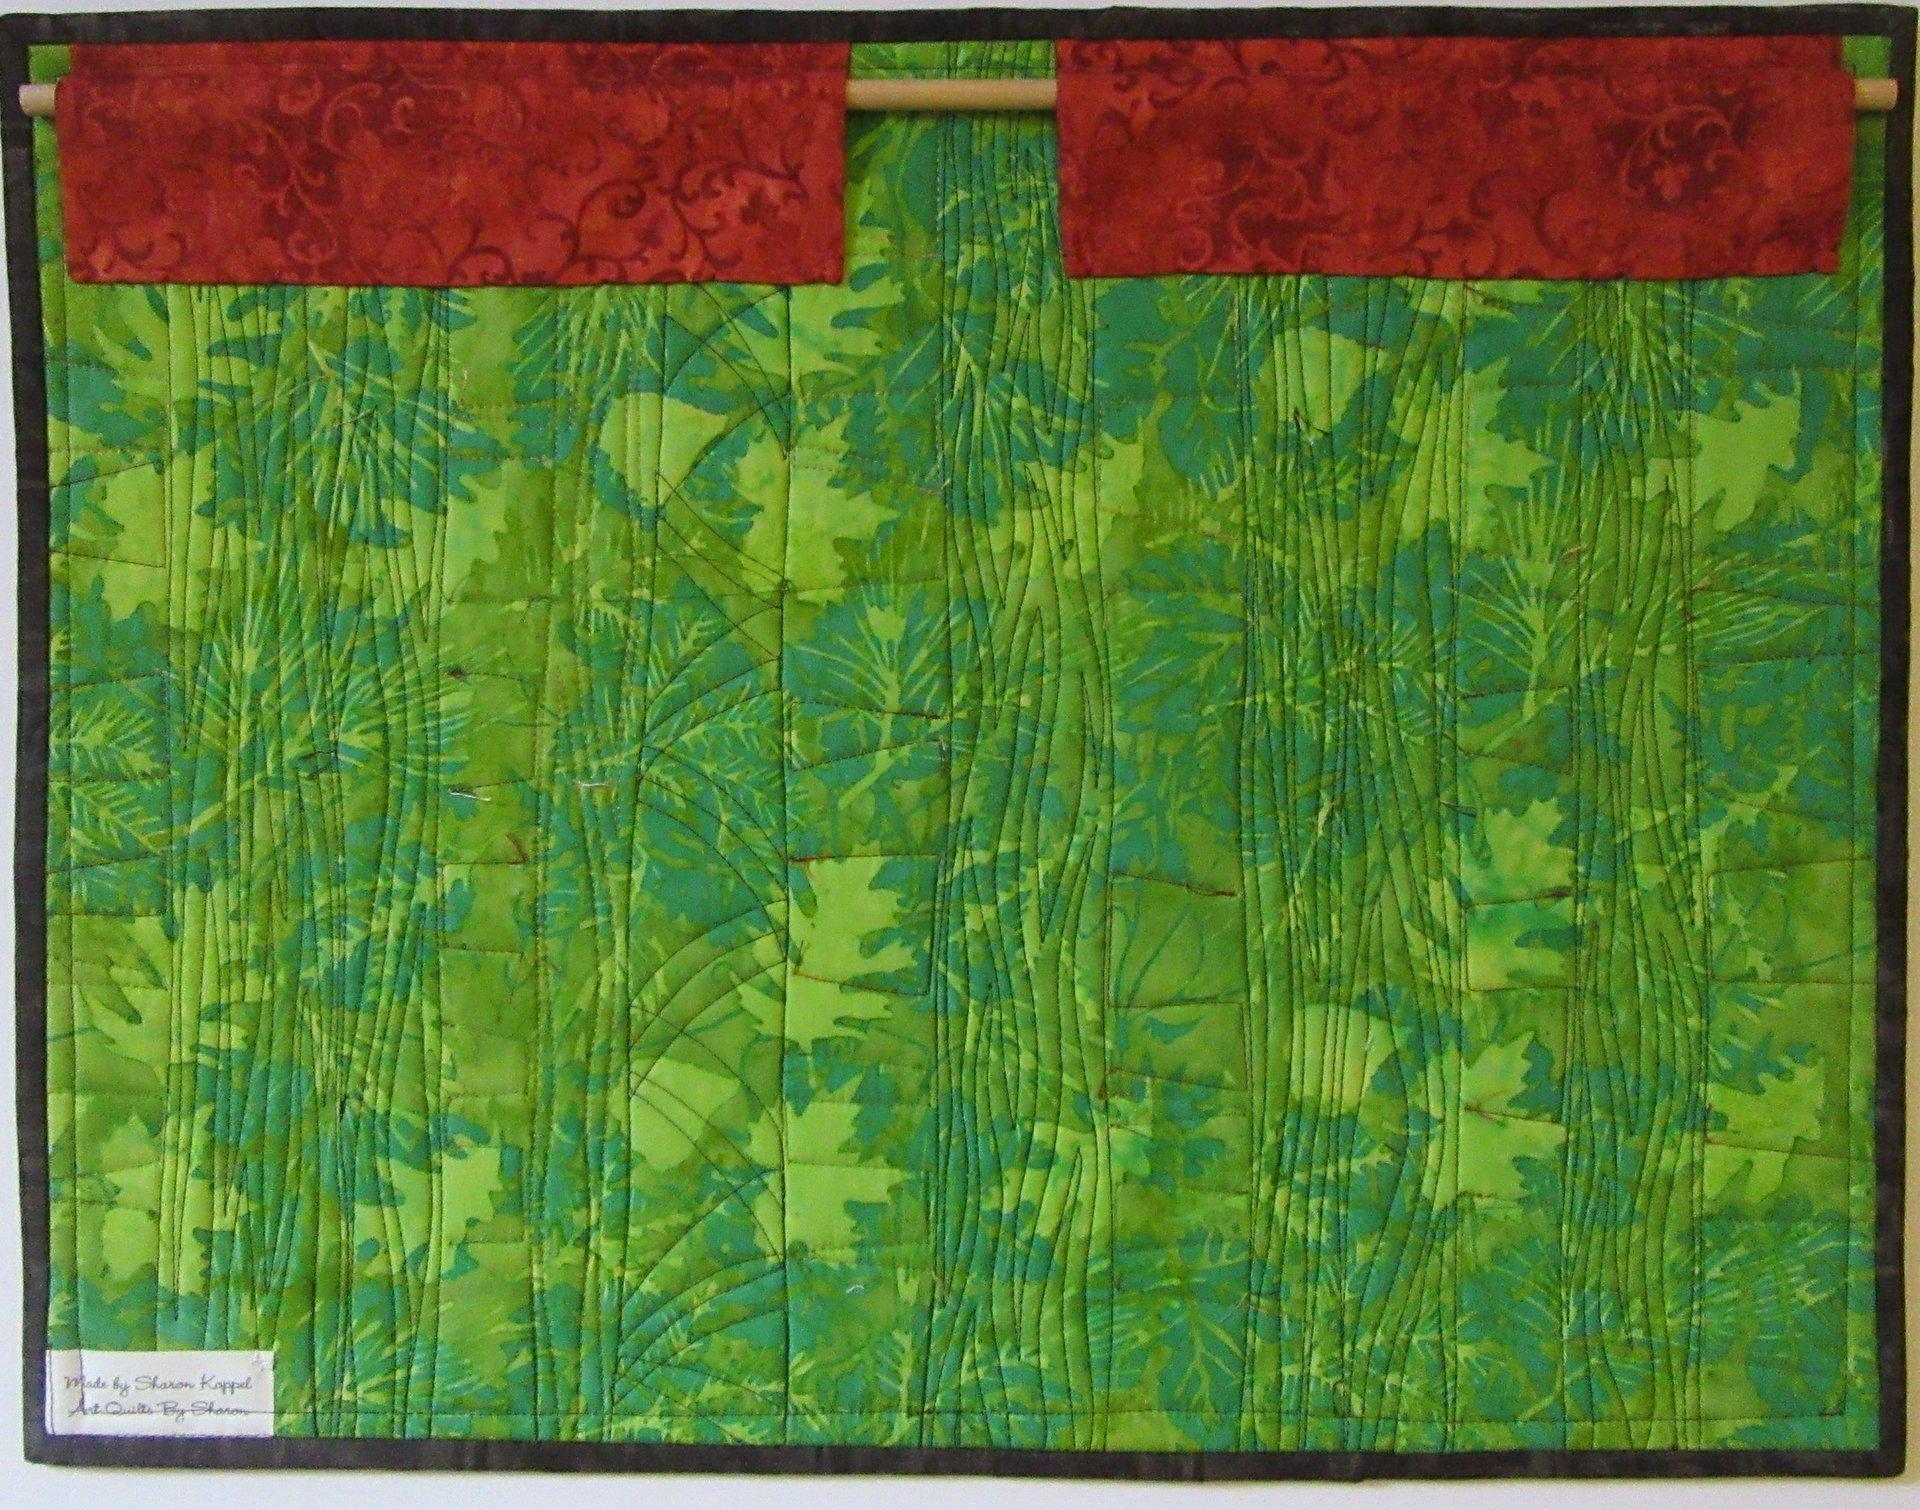 New Art Quilt Hanging Sleeve Design - Art Quilts by Sharon : quilt hanging sleeve - Adamdwight.com